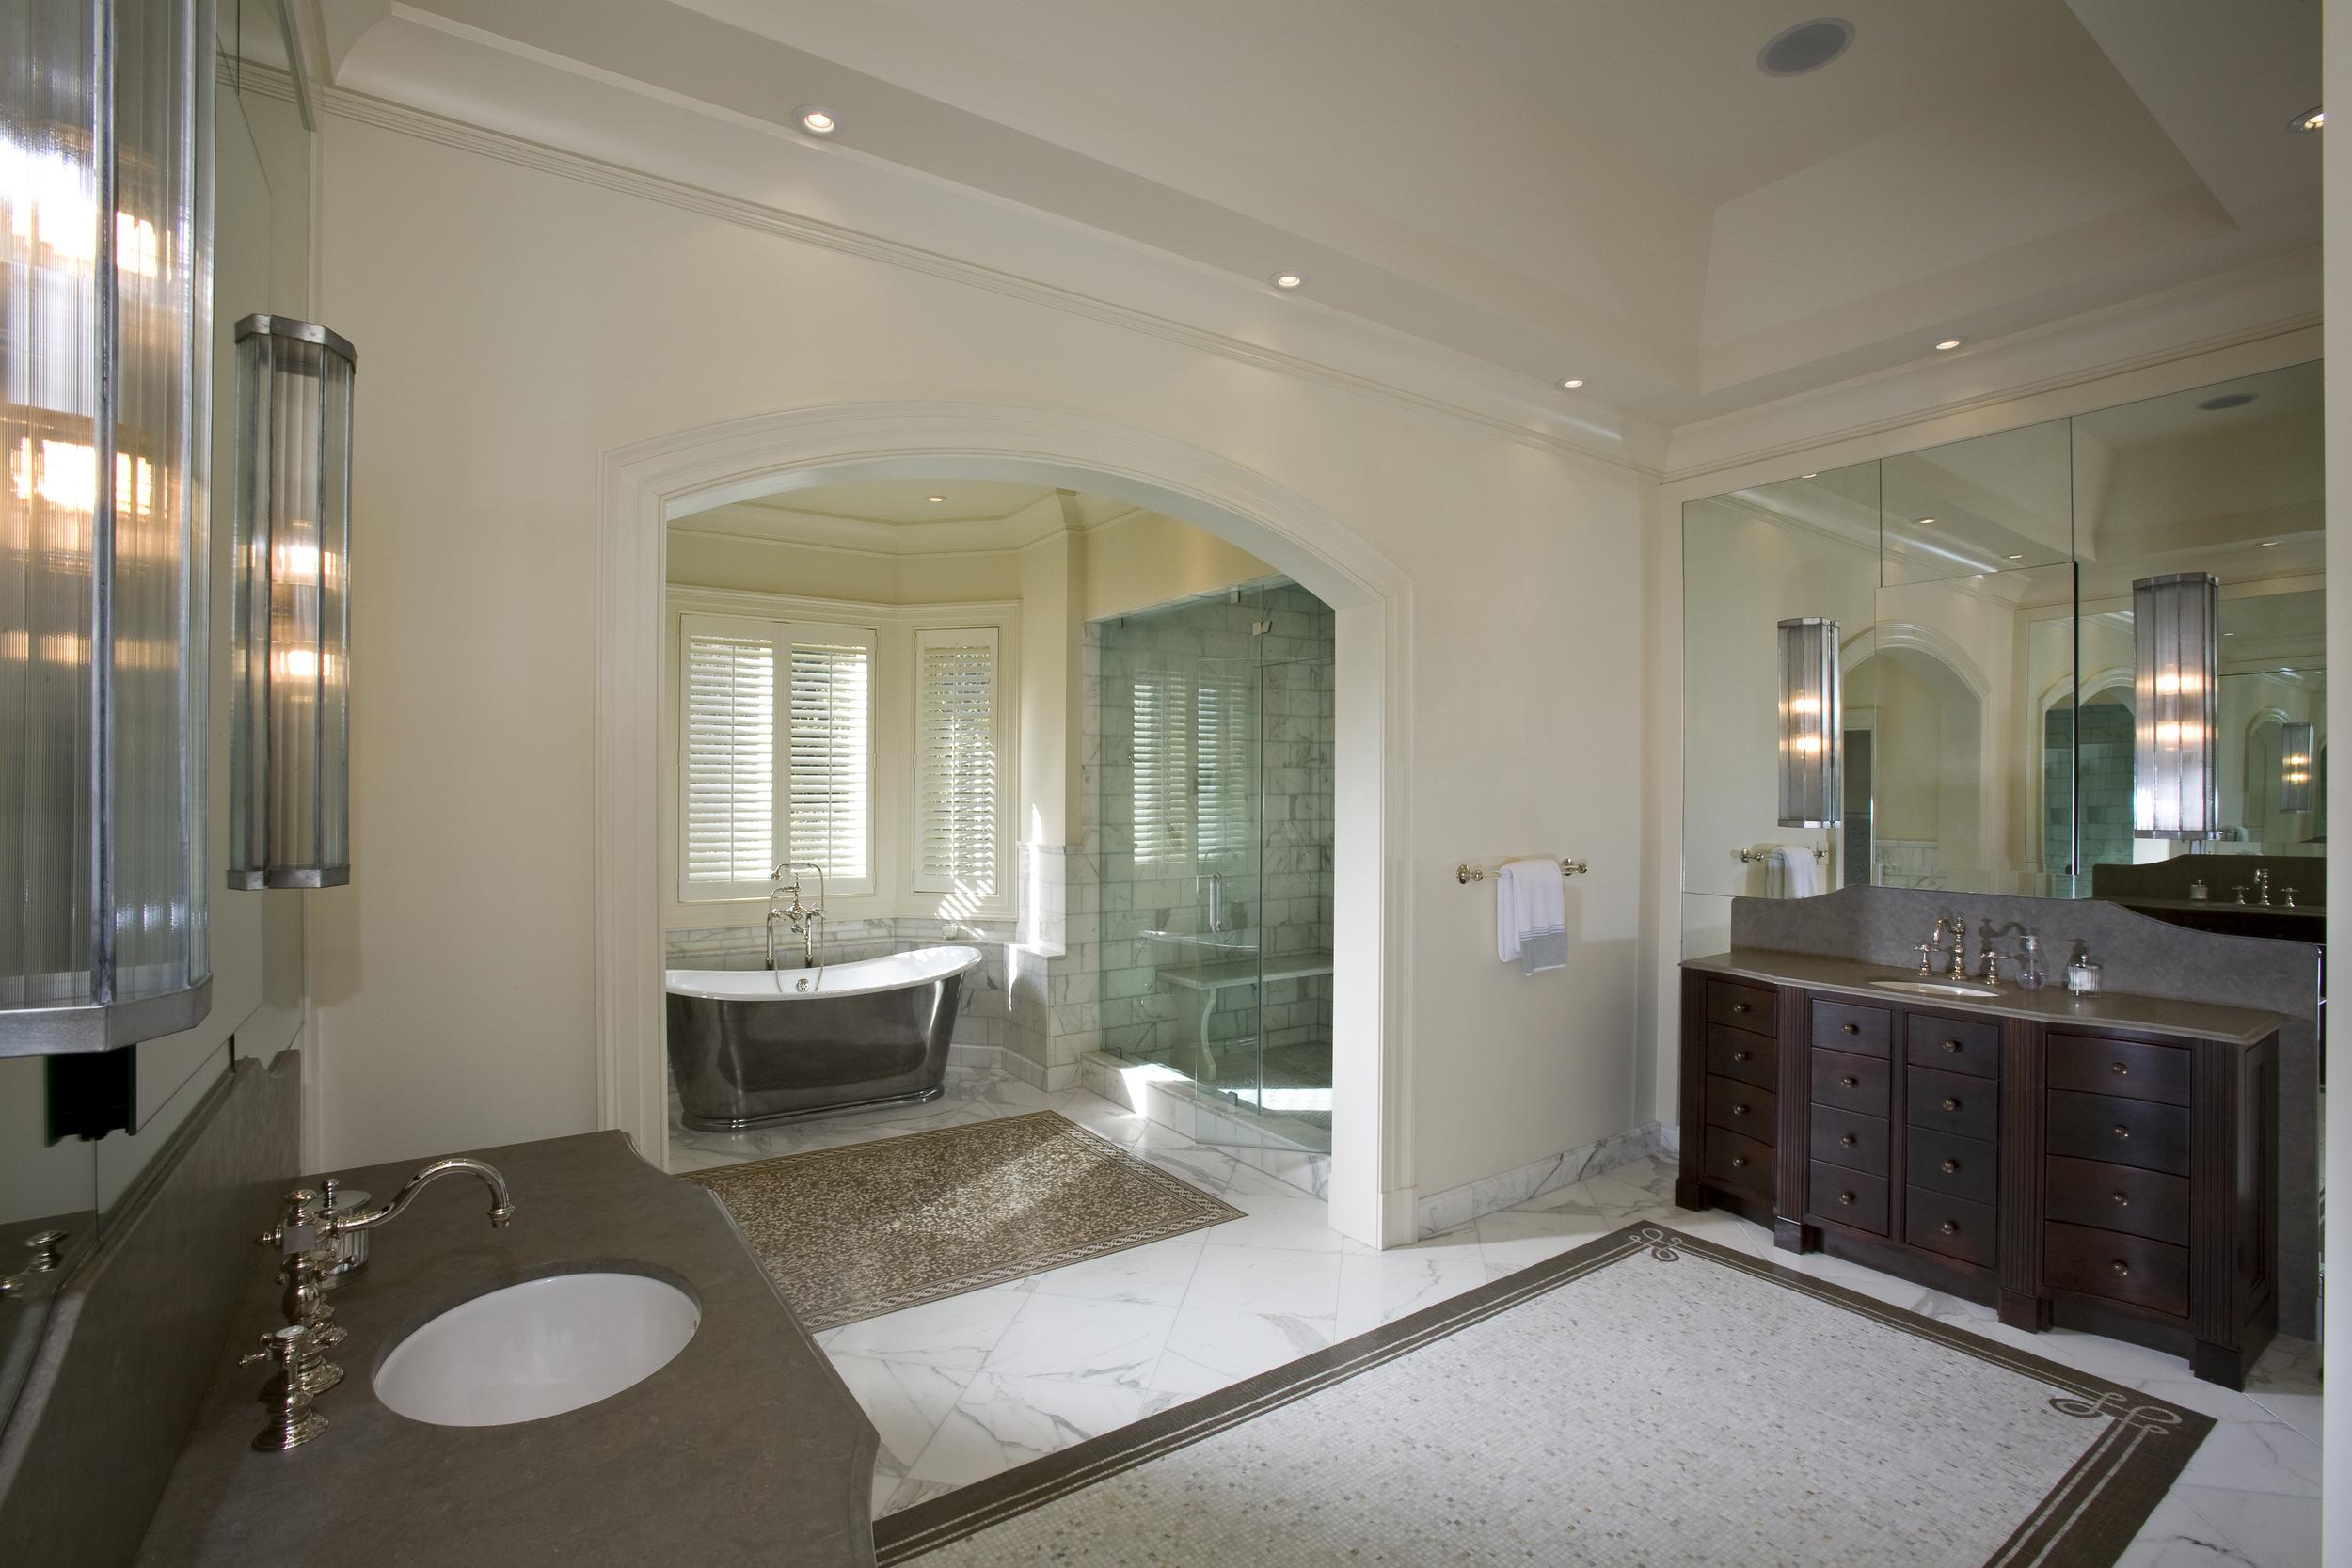 FLC_Bathroom_View-1.jpg